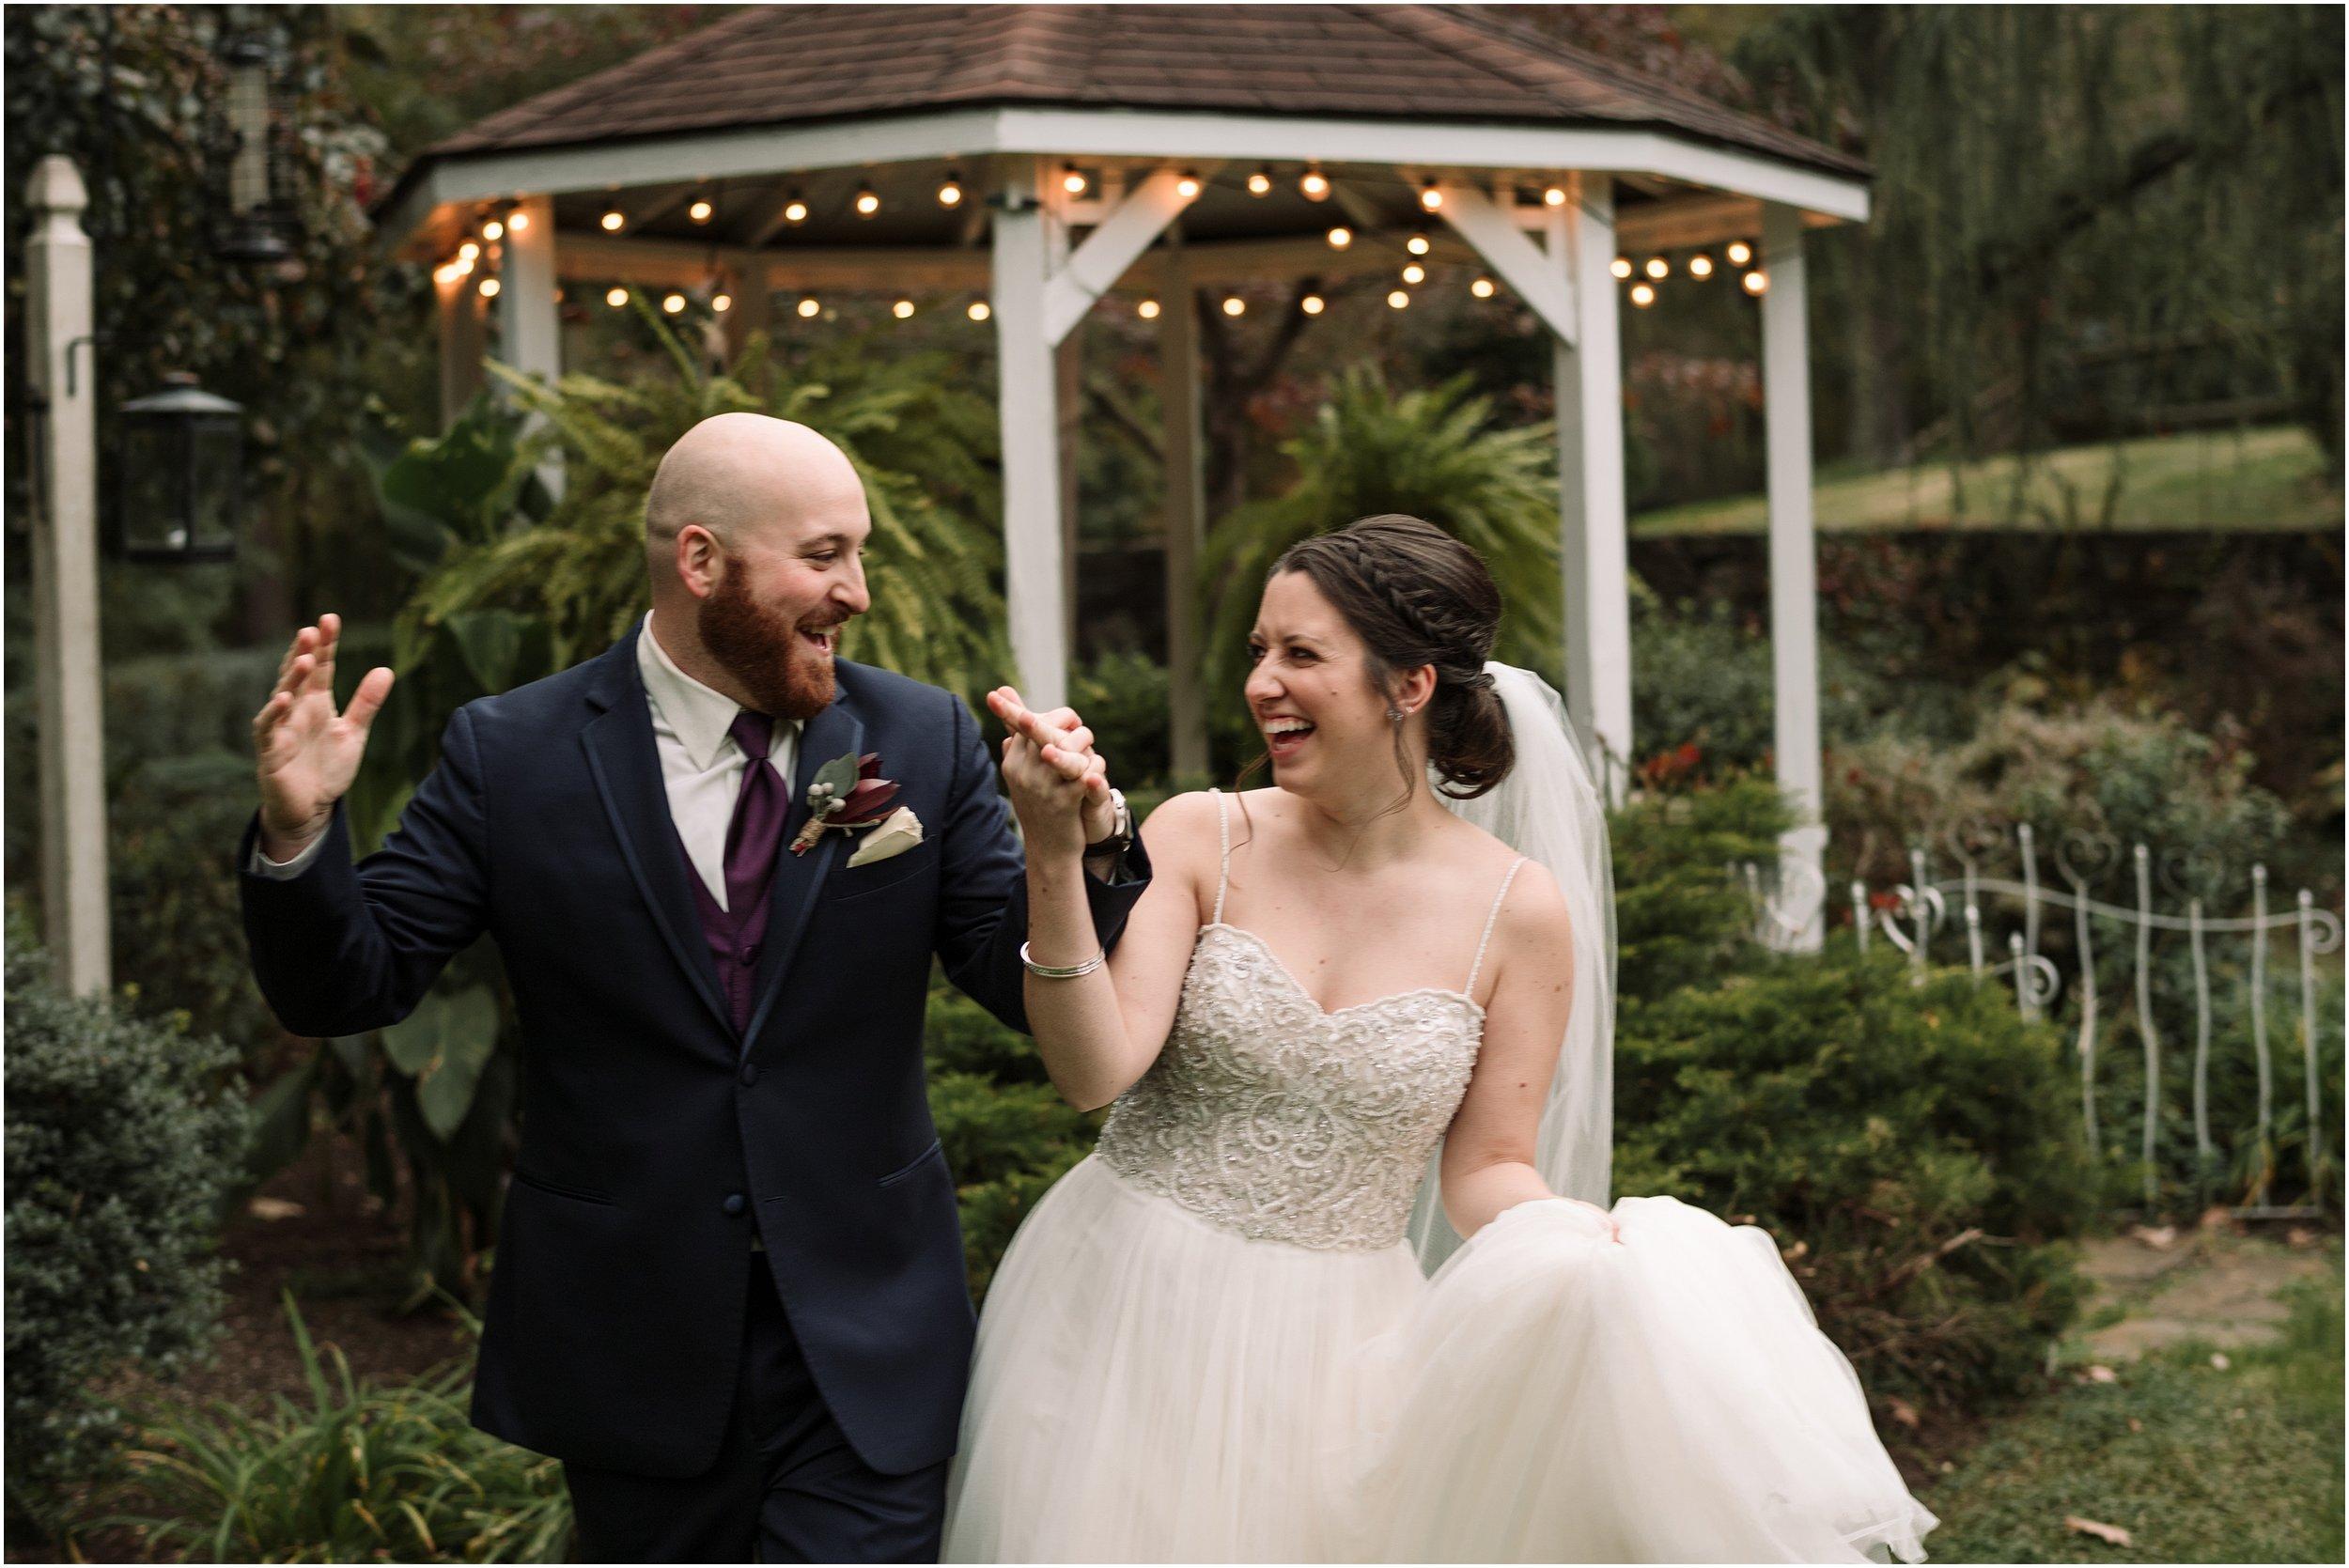 hannah leigh photography riverdale manor wedding lancaster pa_2019.jpg